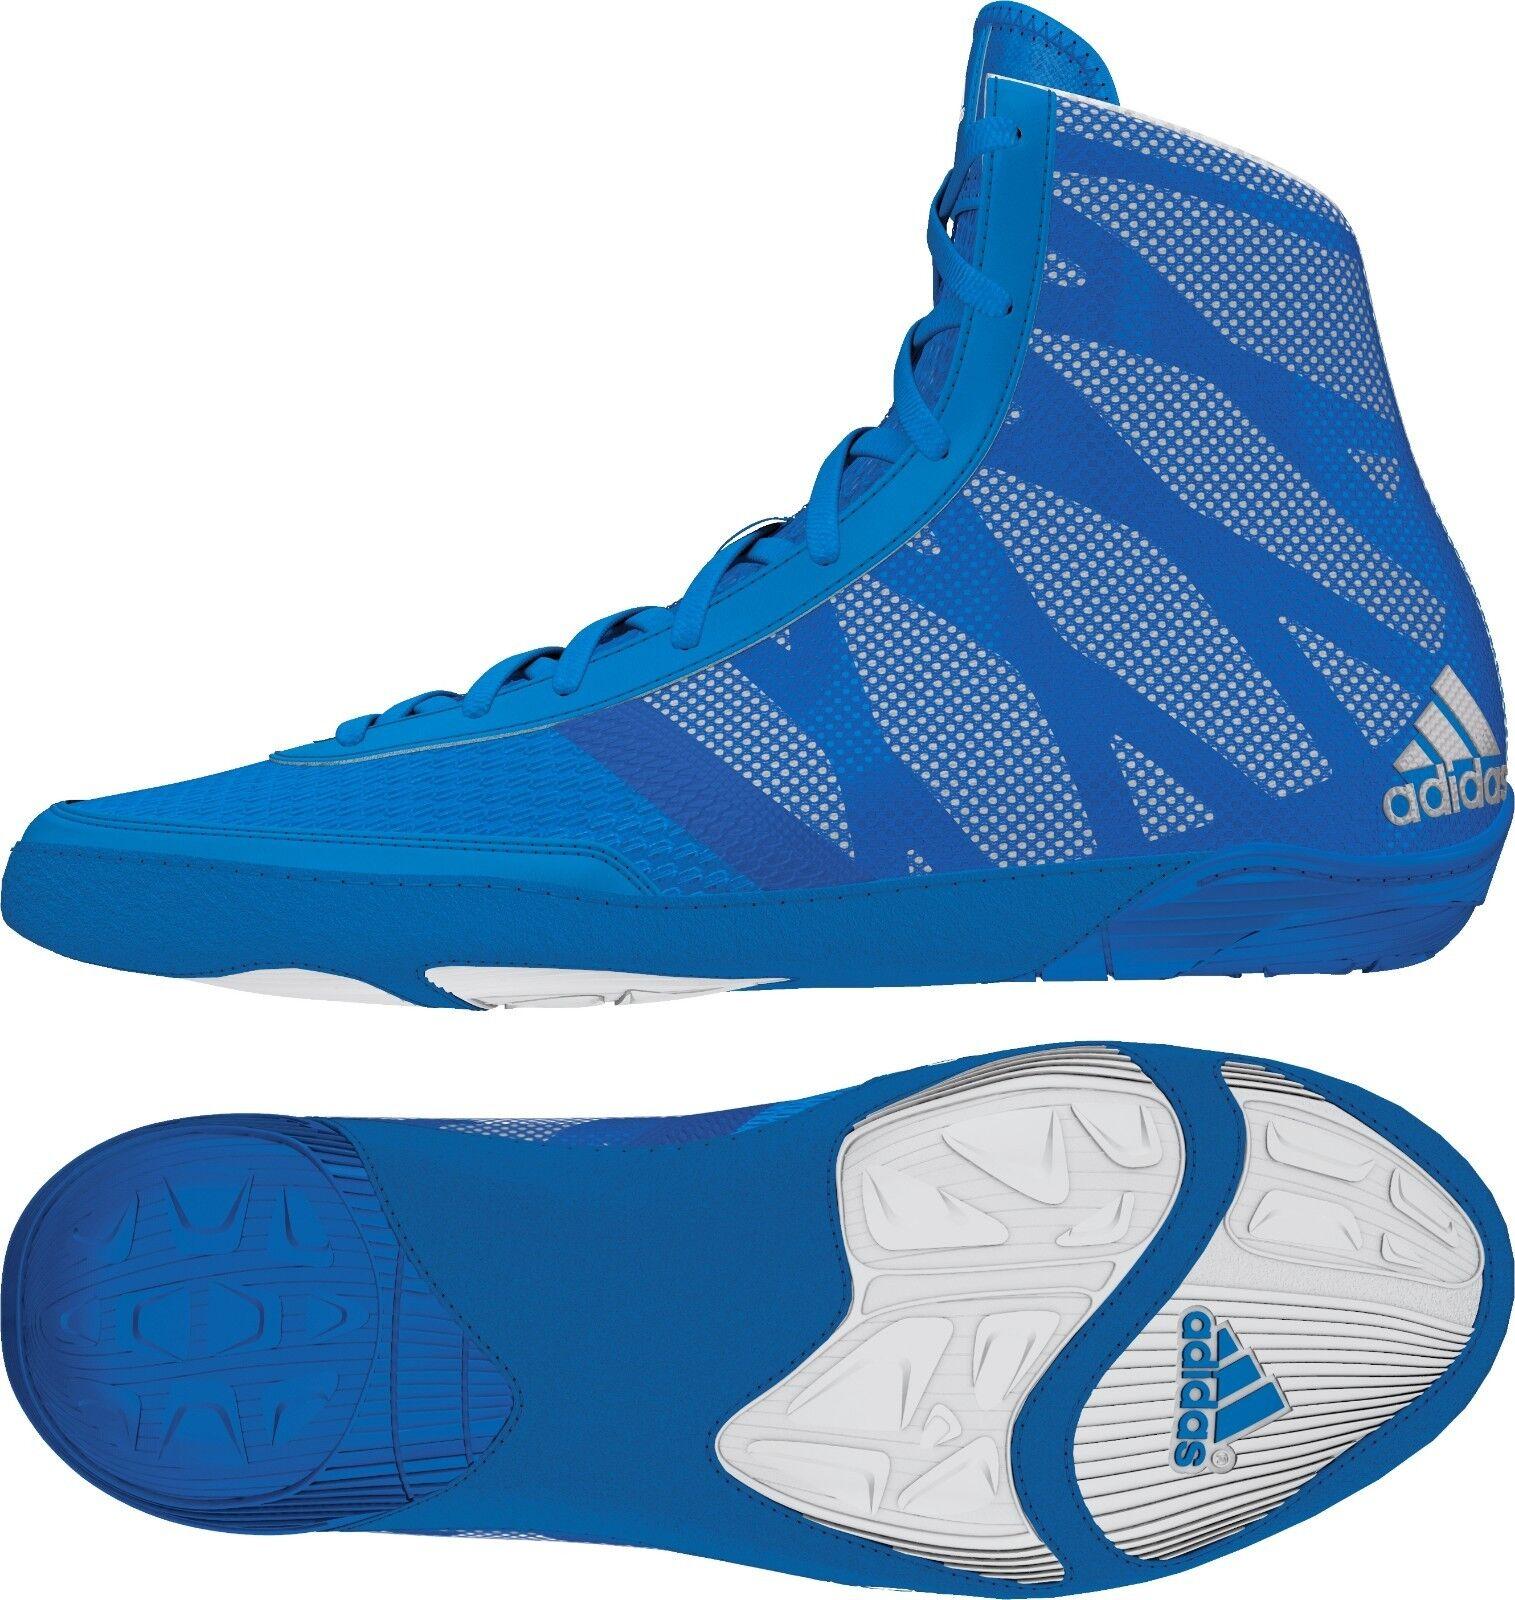 Adidas Pretereo III MEN'S Wrestling Shoes, Royal  Blue, Silver  AQ3292 NEW!